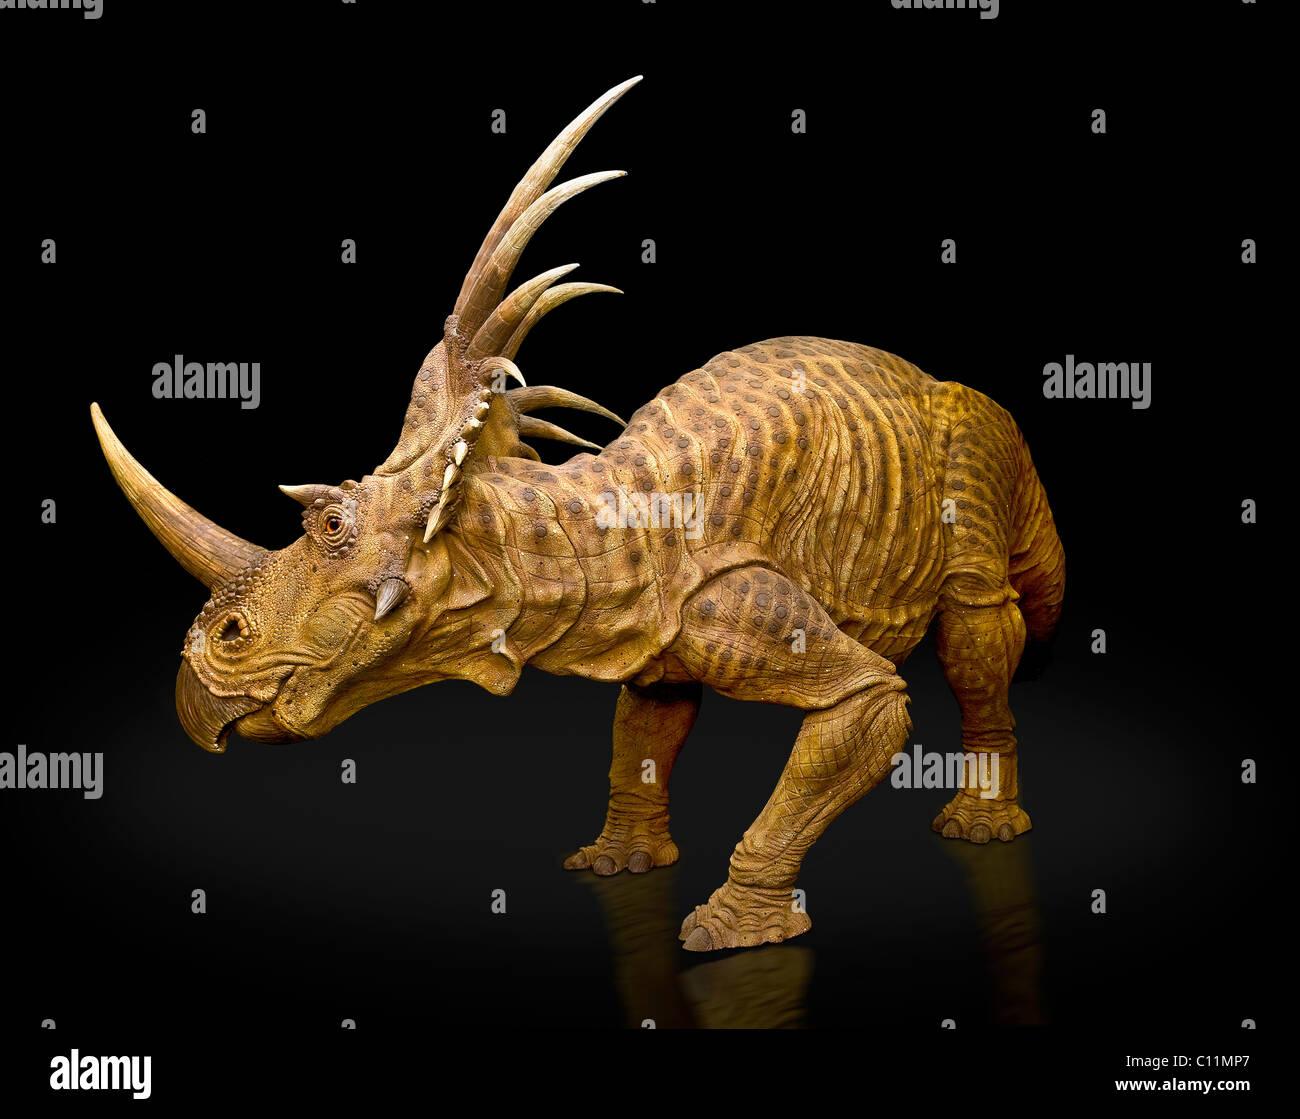 Triceratops mesozoic era dinosaur recreation - Stock Image